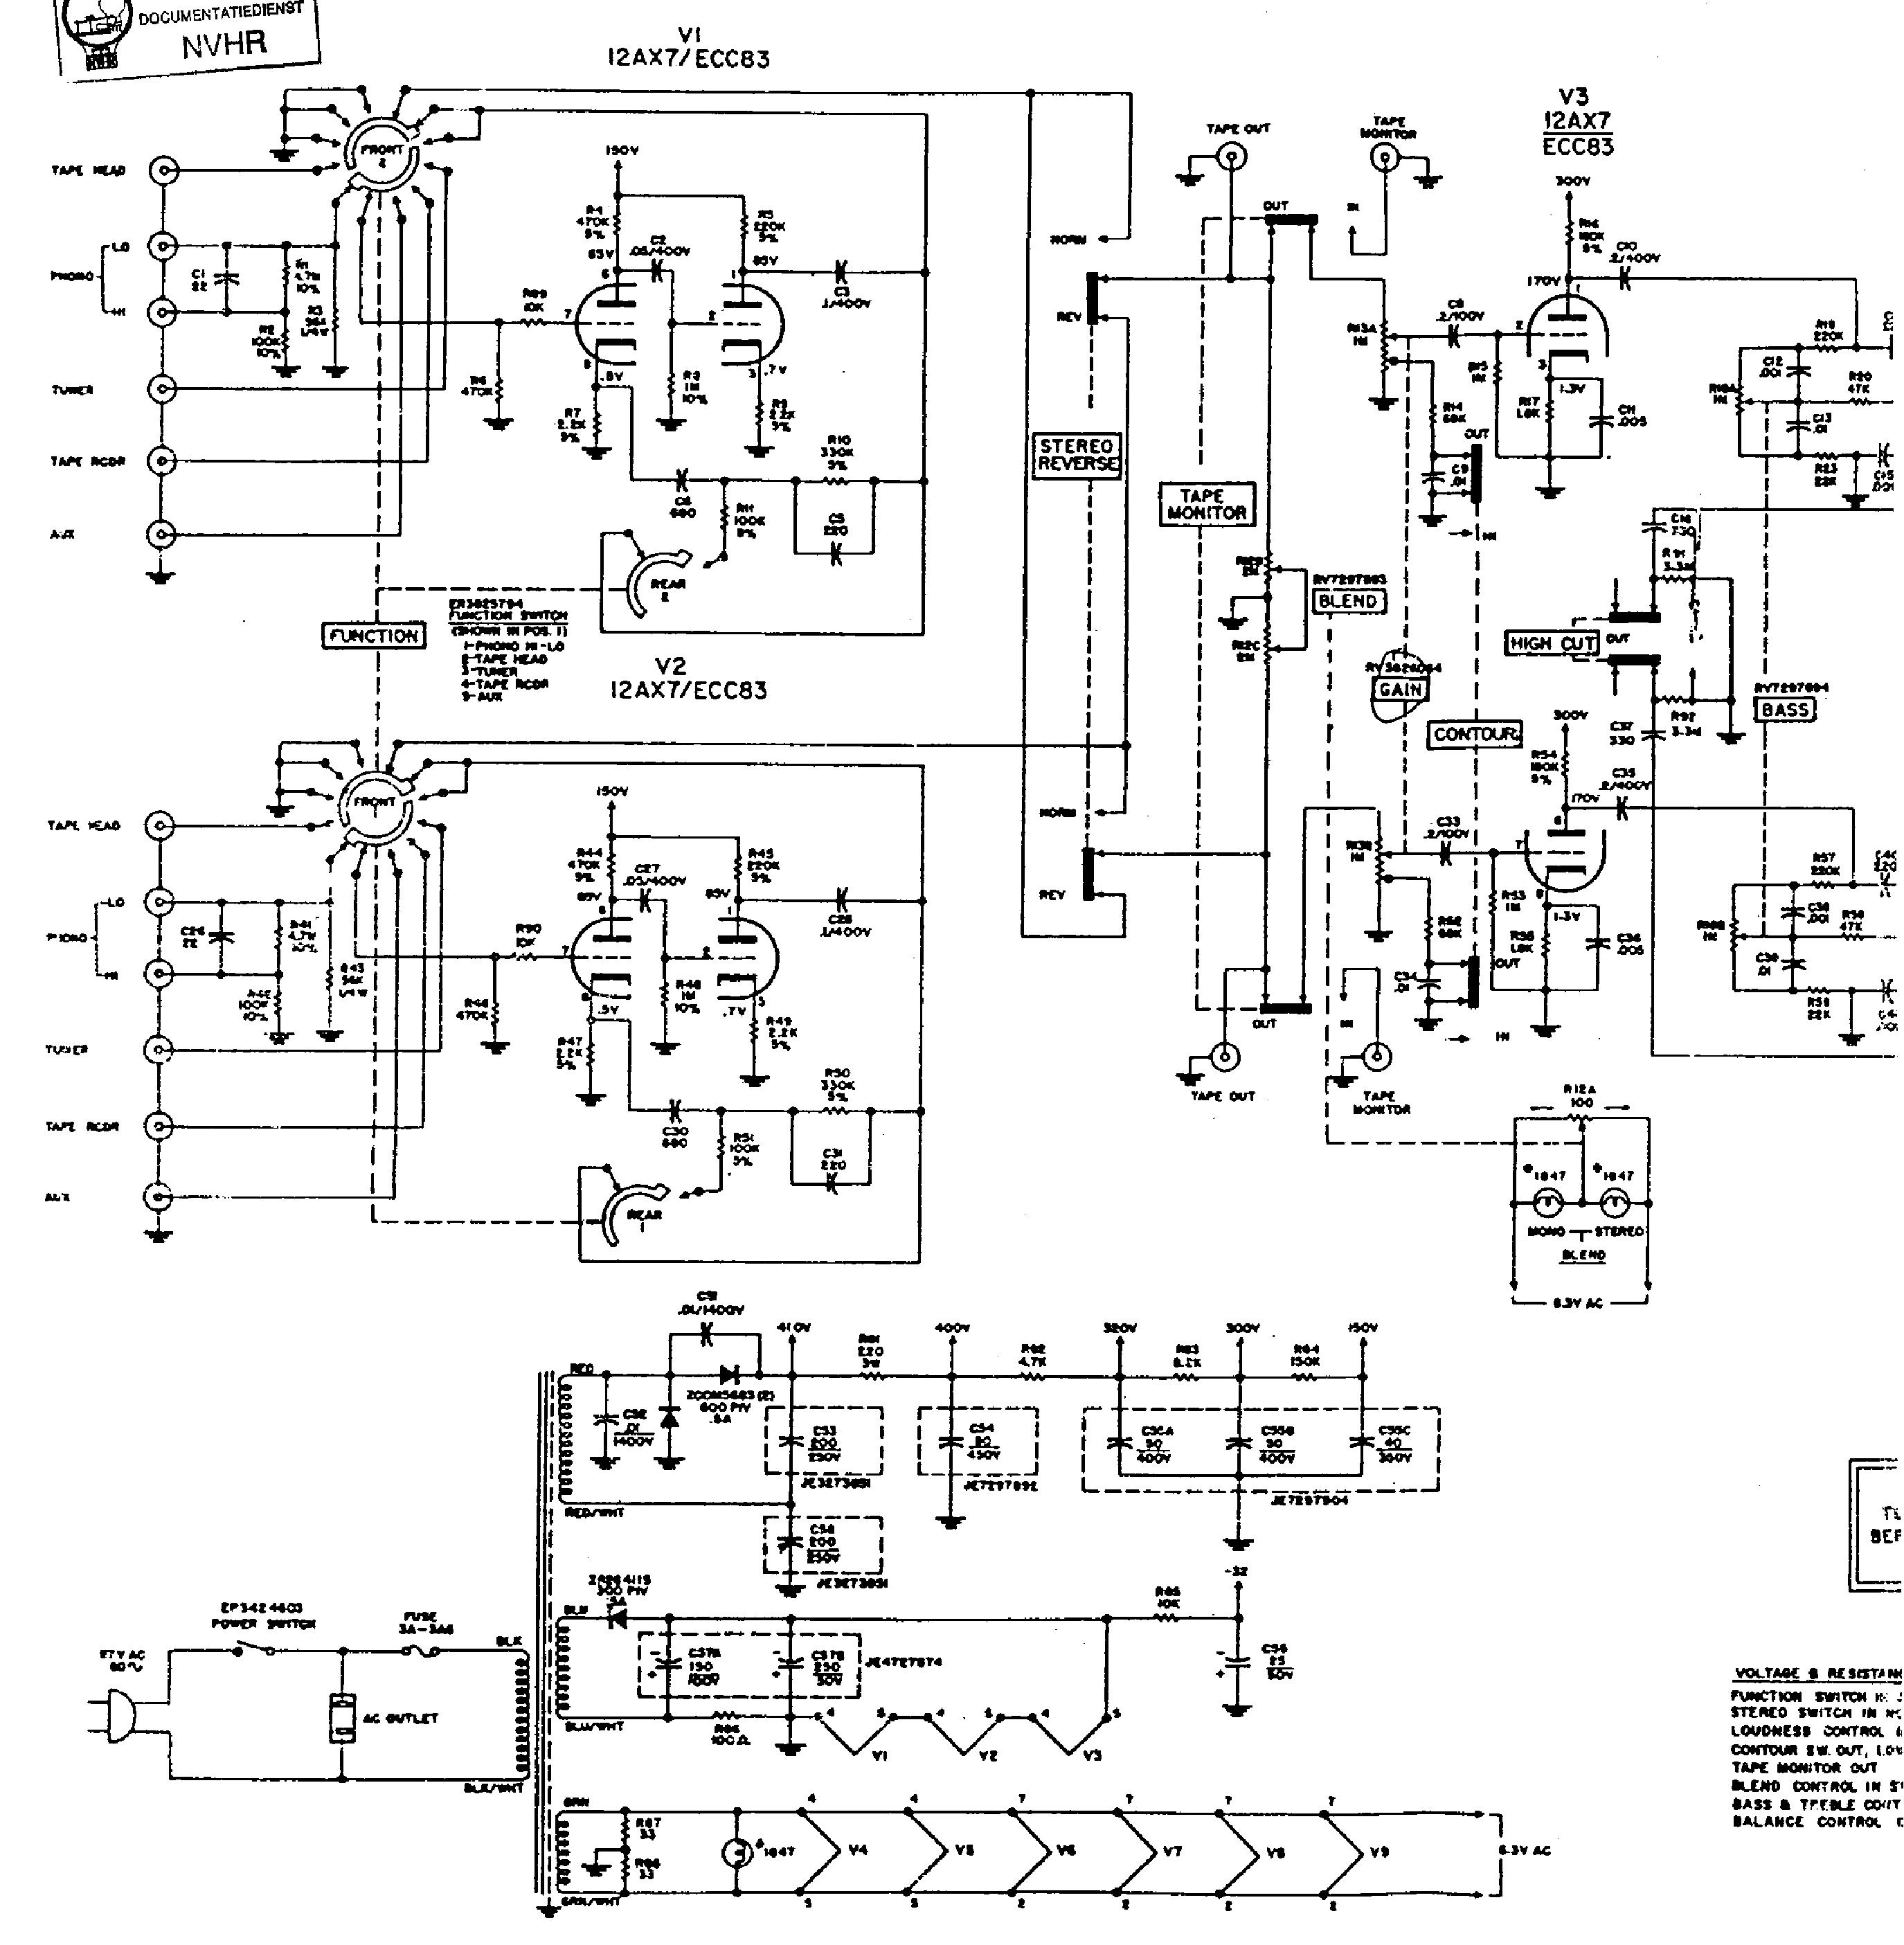 Harman Kardon Avr5500 Sm Service Manual Download Schematics Eeprom Wiring Diagrams Harmankardon